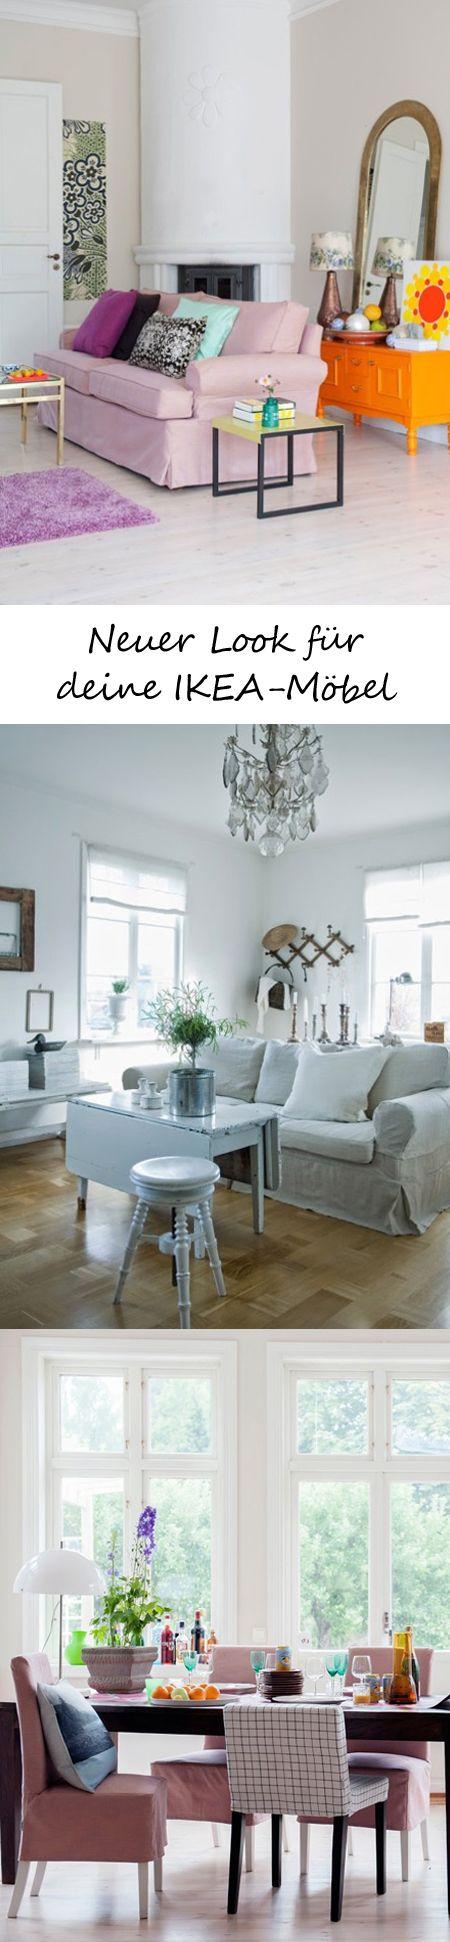 100 best images about aus alt mach neu on pinterest | diy wood ... - Wohnideen Ikea Mbel